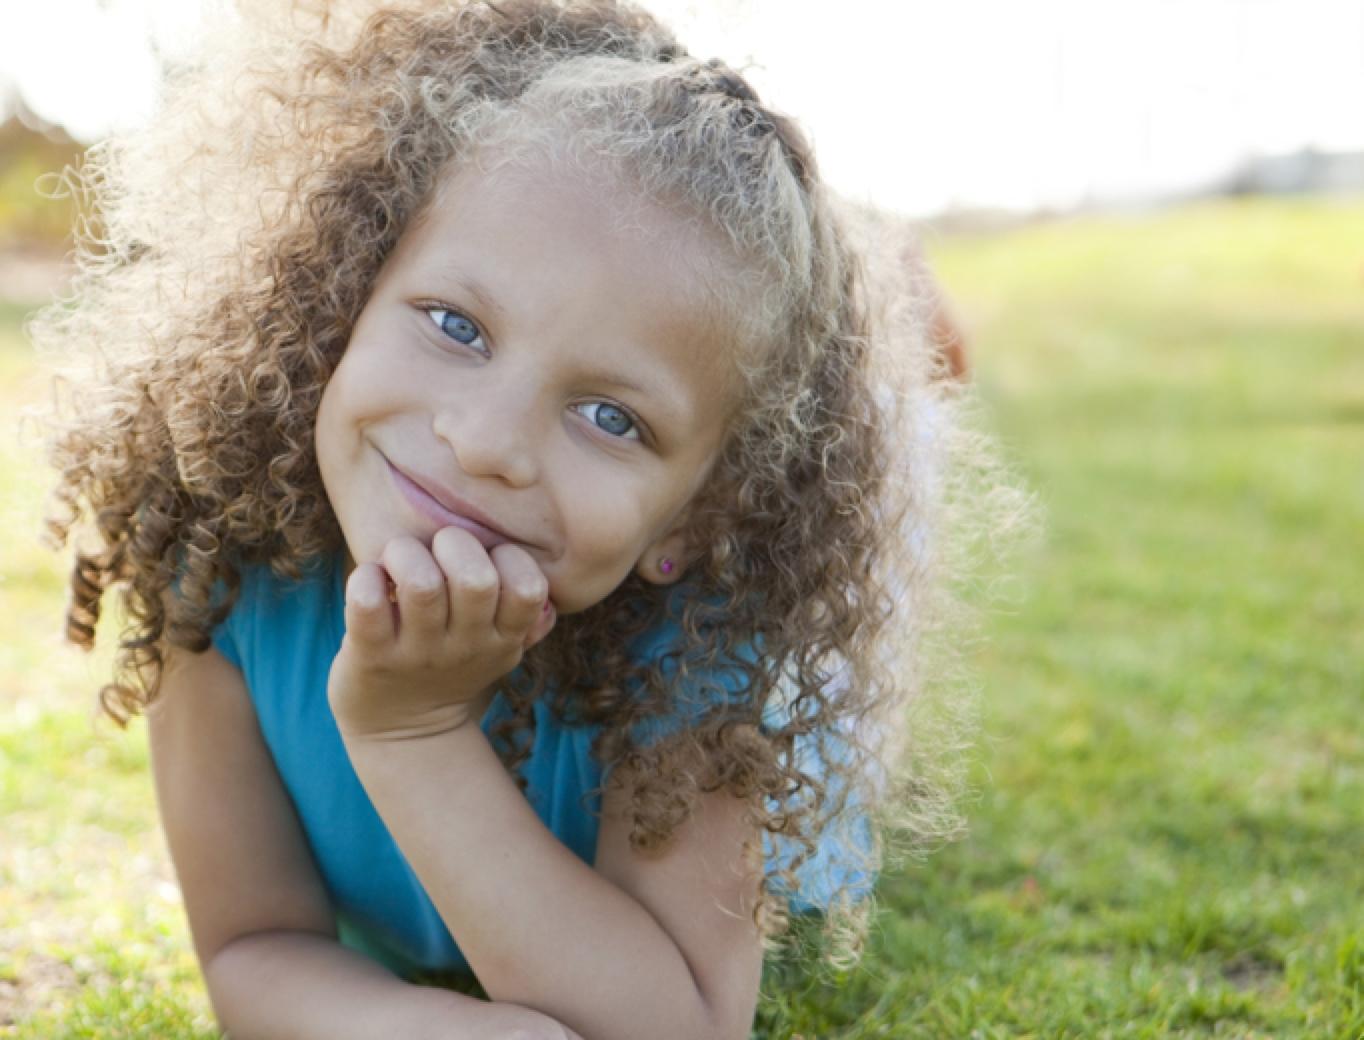 adoption foster care child